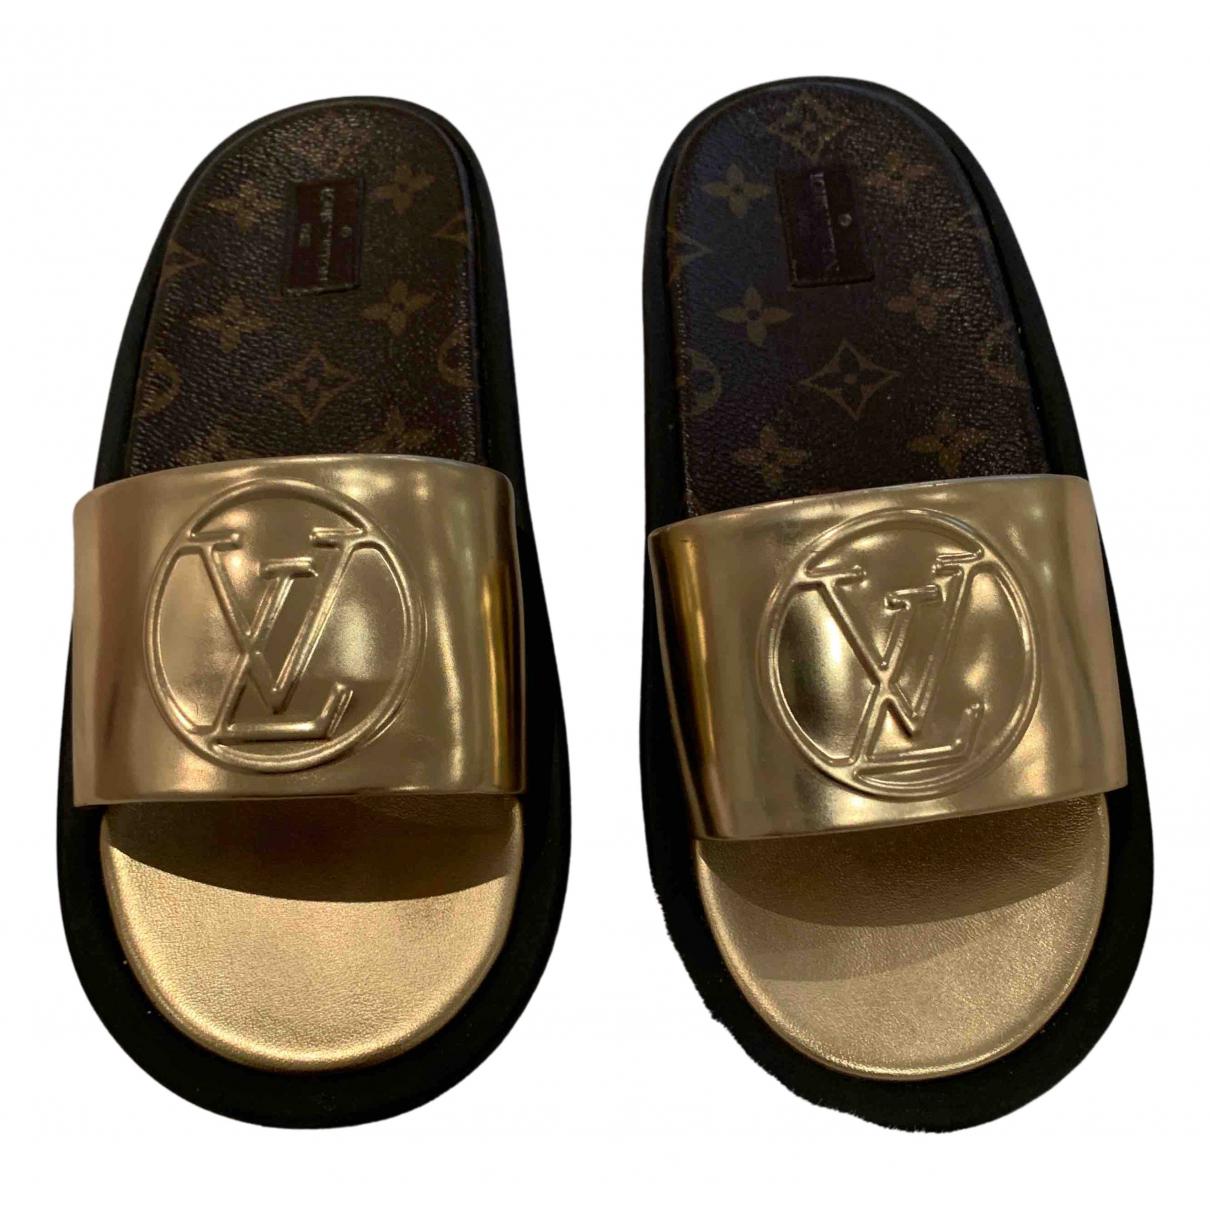 Louis Vuitton N Gold Leather Mules & Clogs for Women 40 EU